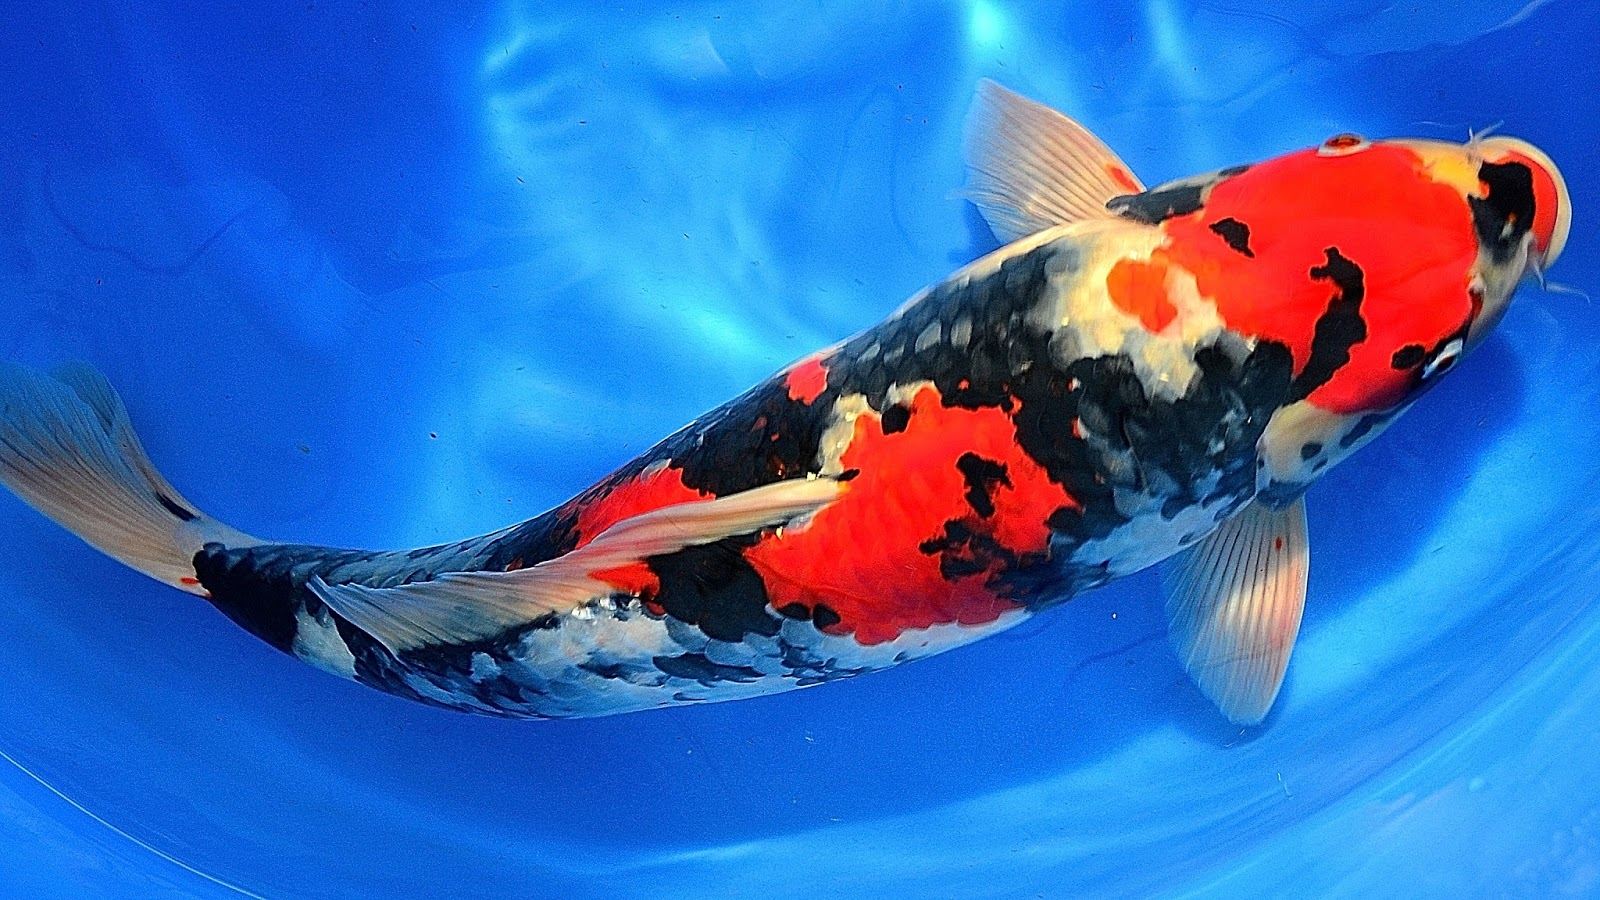 koi fish size - People.davidjoel.co